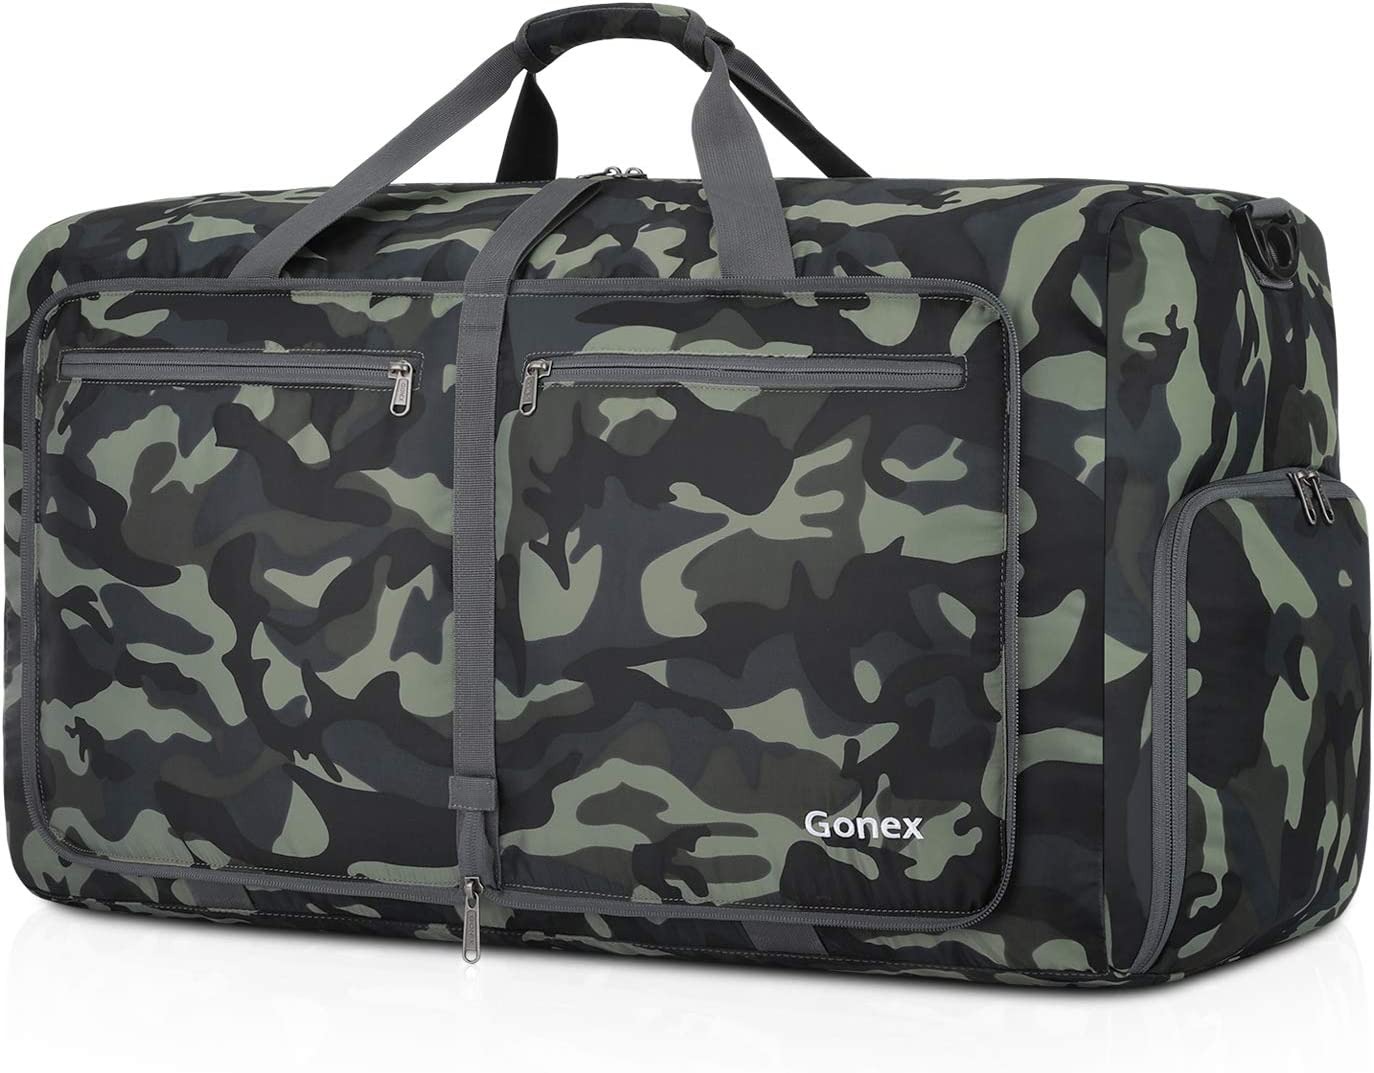 Gonex Bolsa de Viaje 100L, Plegable Ligero Bolso Equipaje Maleta Grande Bolsas Deportes Gimnasio Maletas de Mano Impermeable Duffel Travel Bag para Hombres y Mujeres Fin de Semana (Verde Camuflaje)